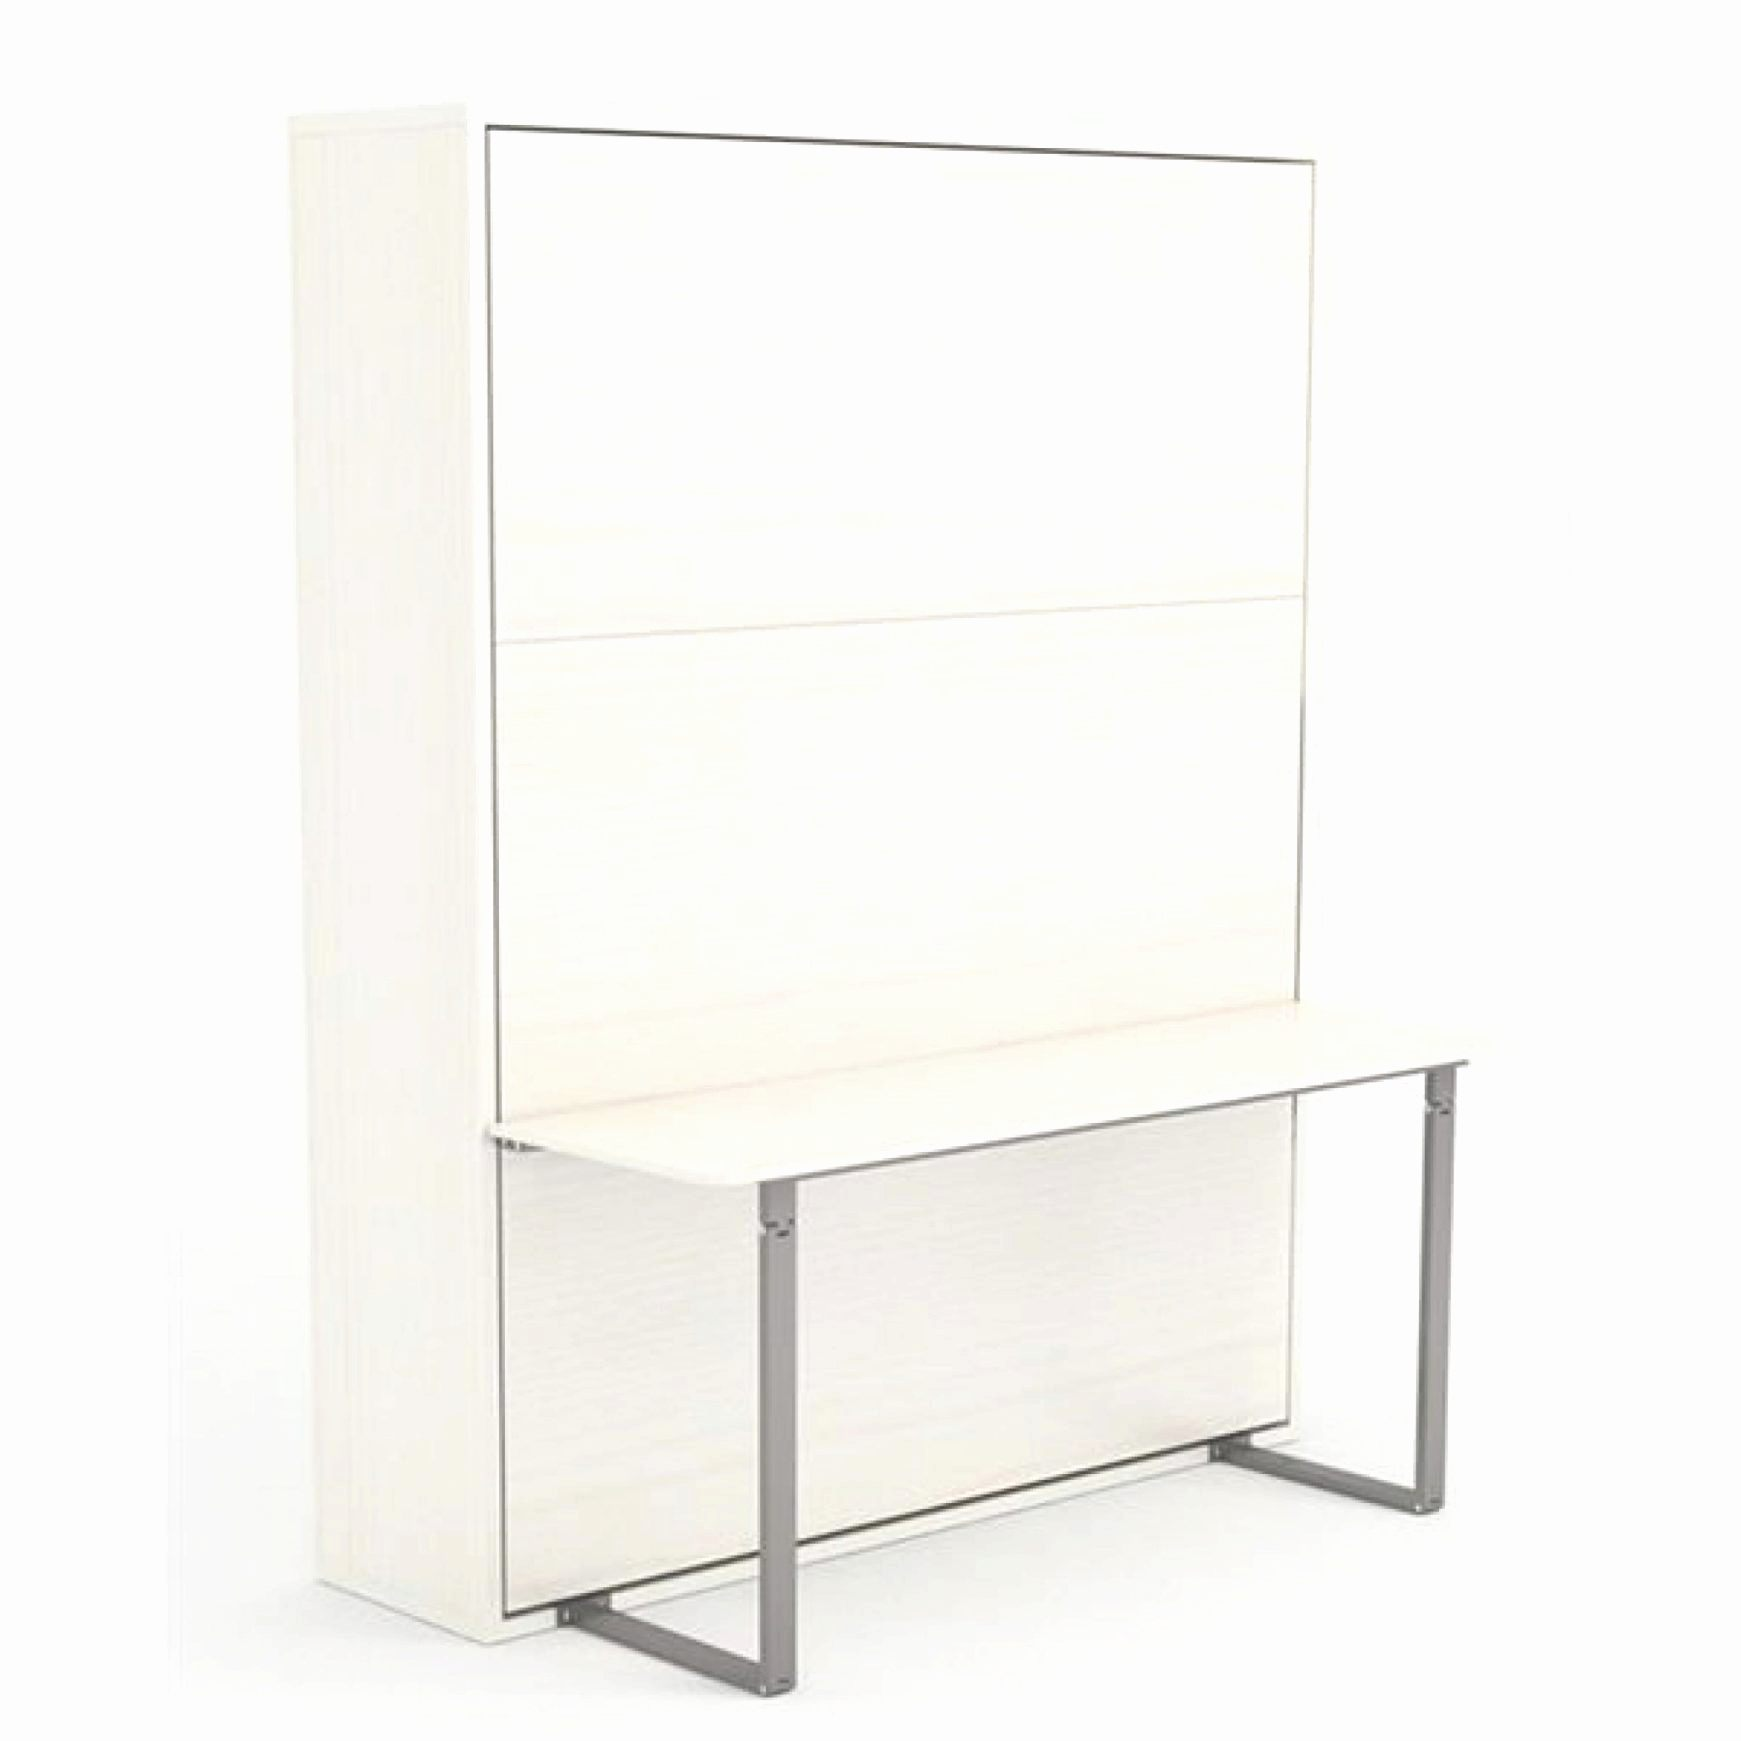 Ikea Lit Pliant Luxe attrayant Lit Armoire Escamotable Ikea Et Bureau Pliable Mural Ikea